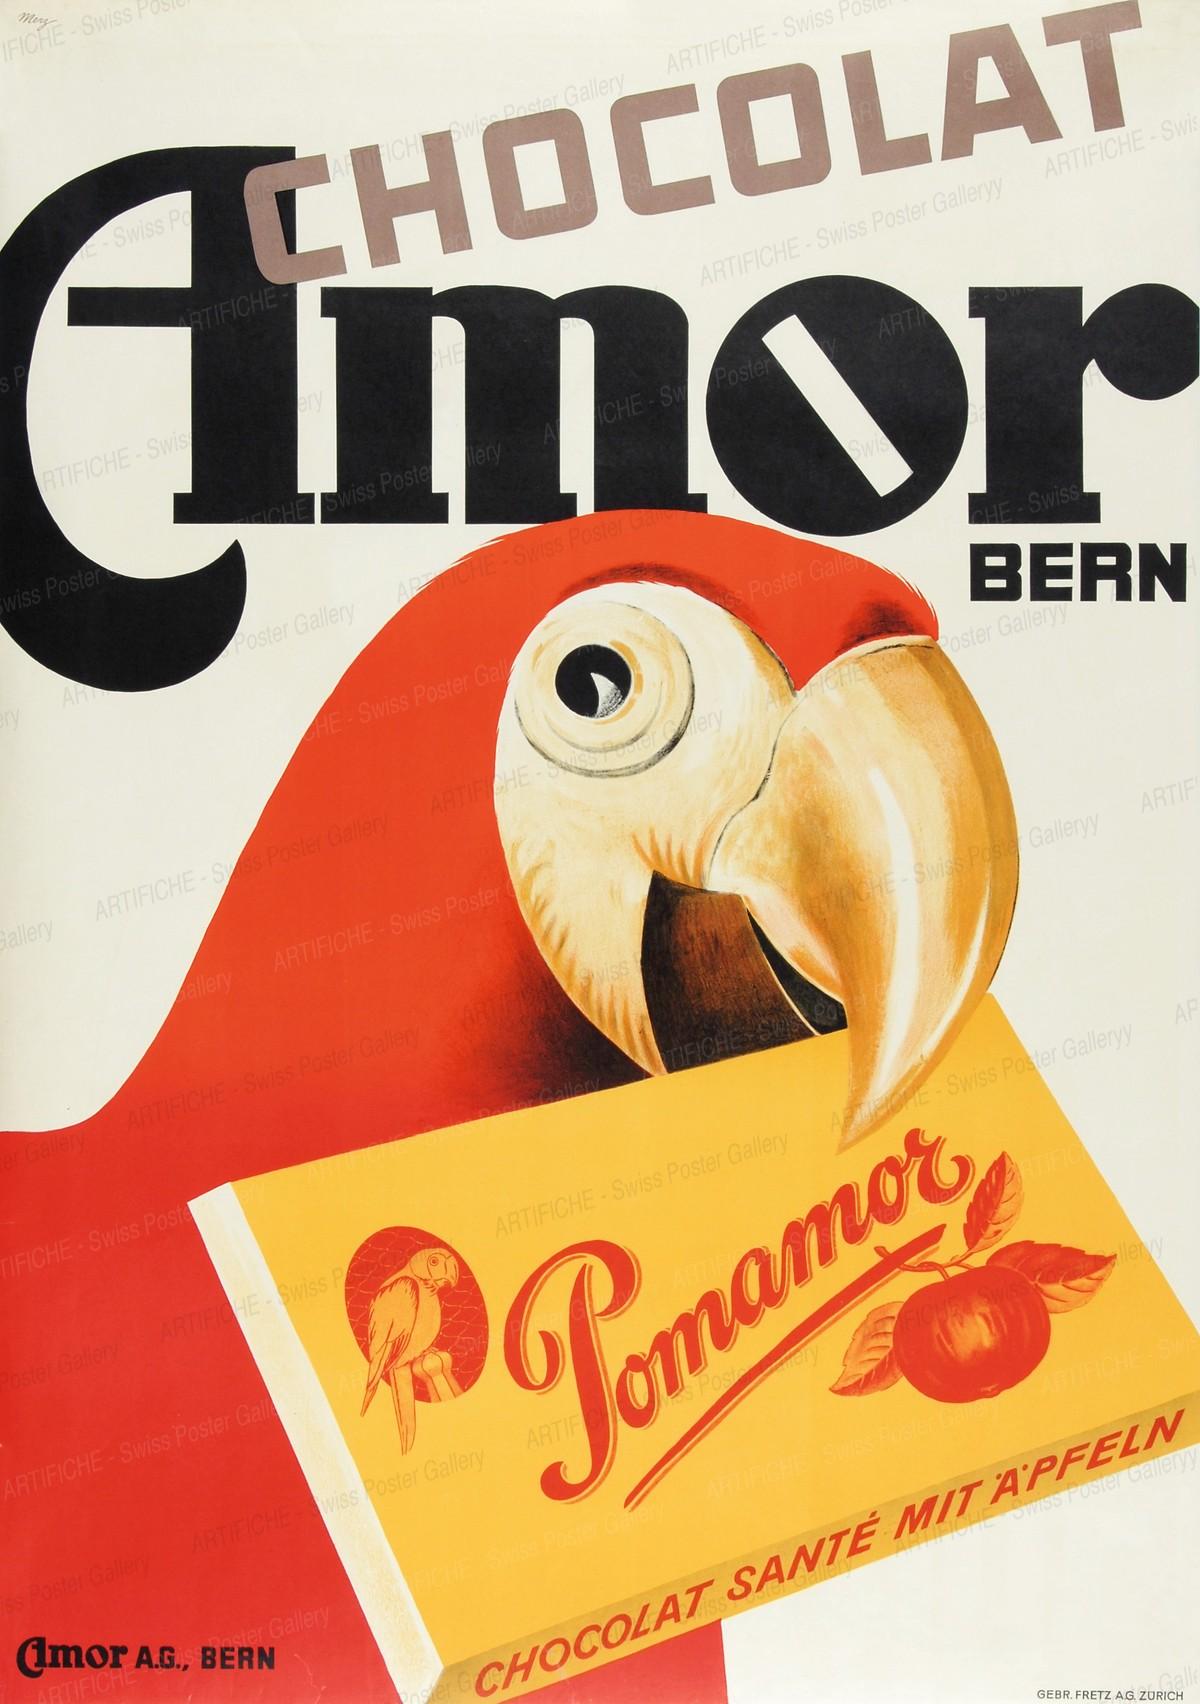 Chocolat Amor AG, Bern, Merz